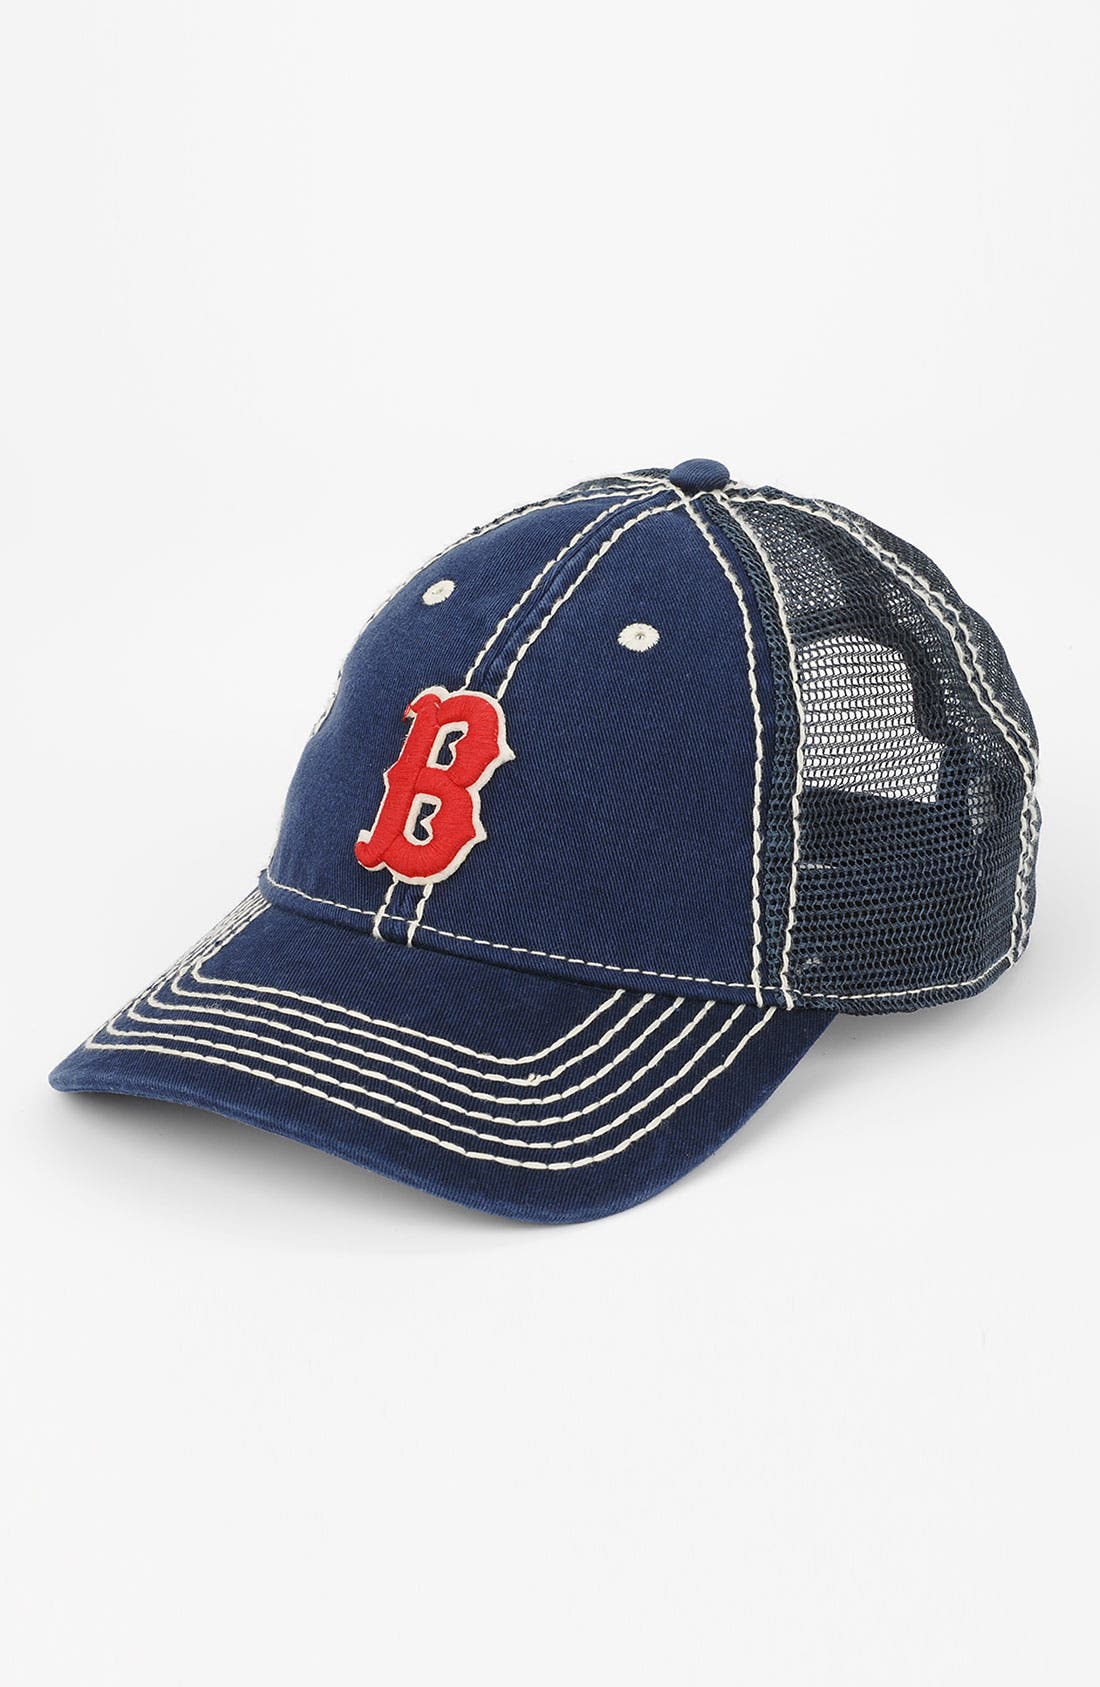 Main Image - American Needle 'Red Sox' Mesh Back Baseball Cap